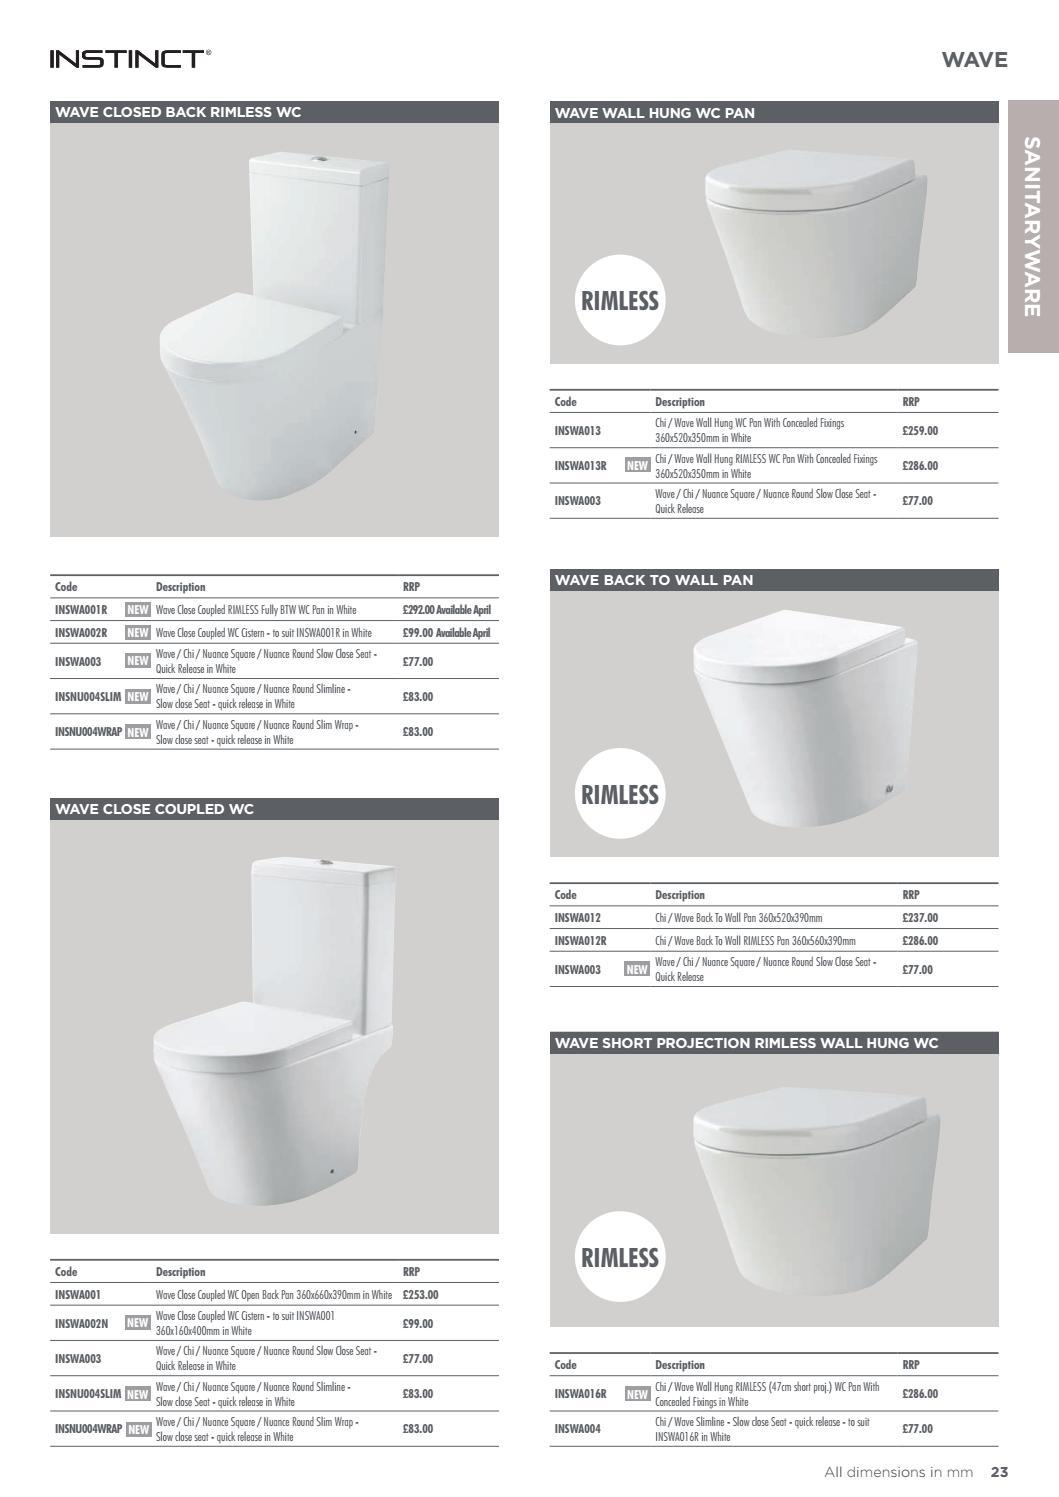 Groovy Tf Bathroom Brochure 2018 By Tucker French Issuu Bralicious Painted Fabric Chair Ideas Braliciousco